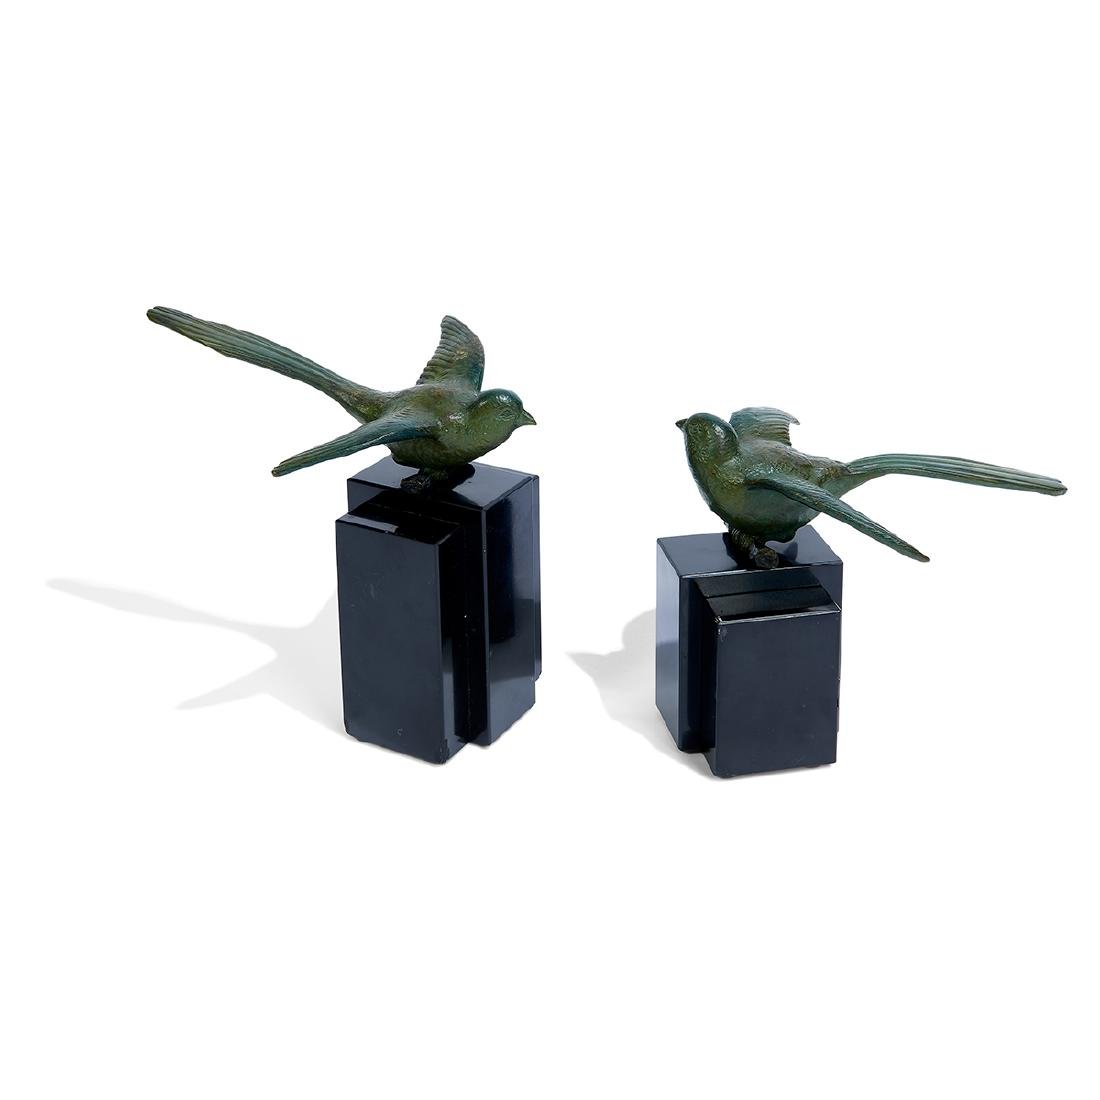 Georges Lavroff, Art Deco Bird Sculptures, Pair